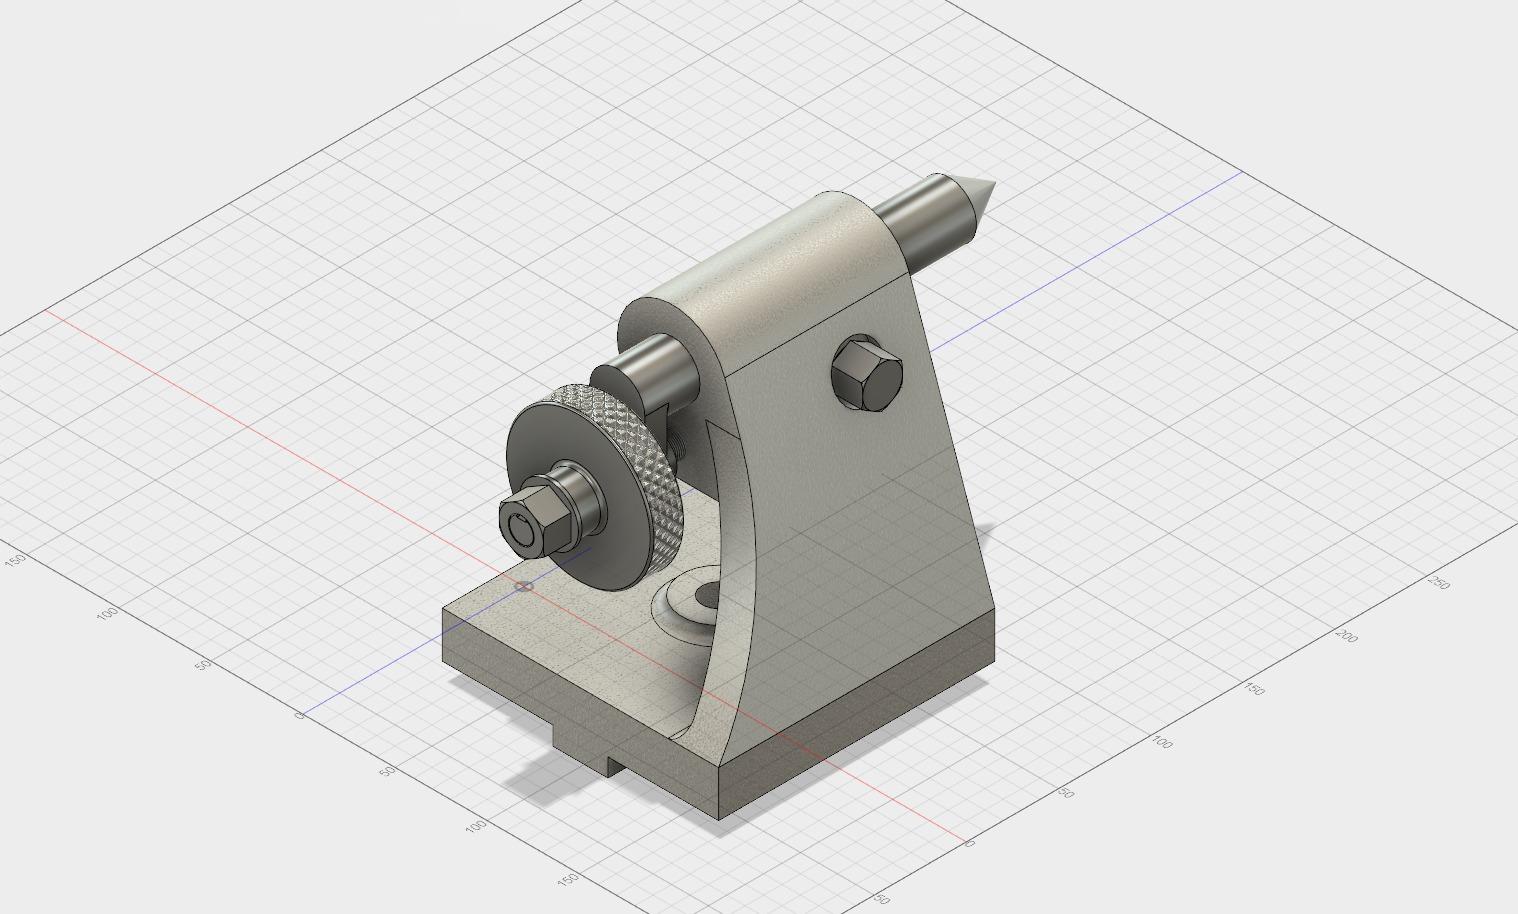 milling machine tailstock